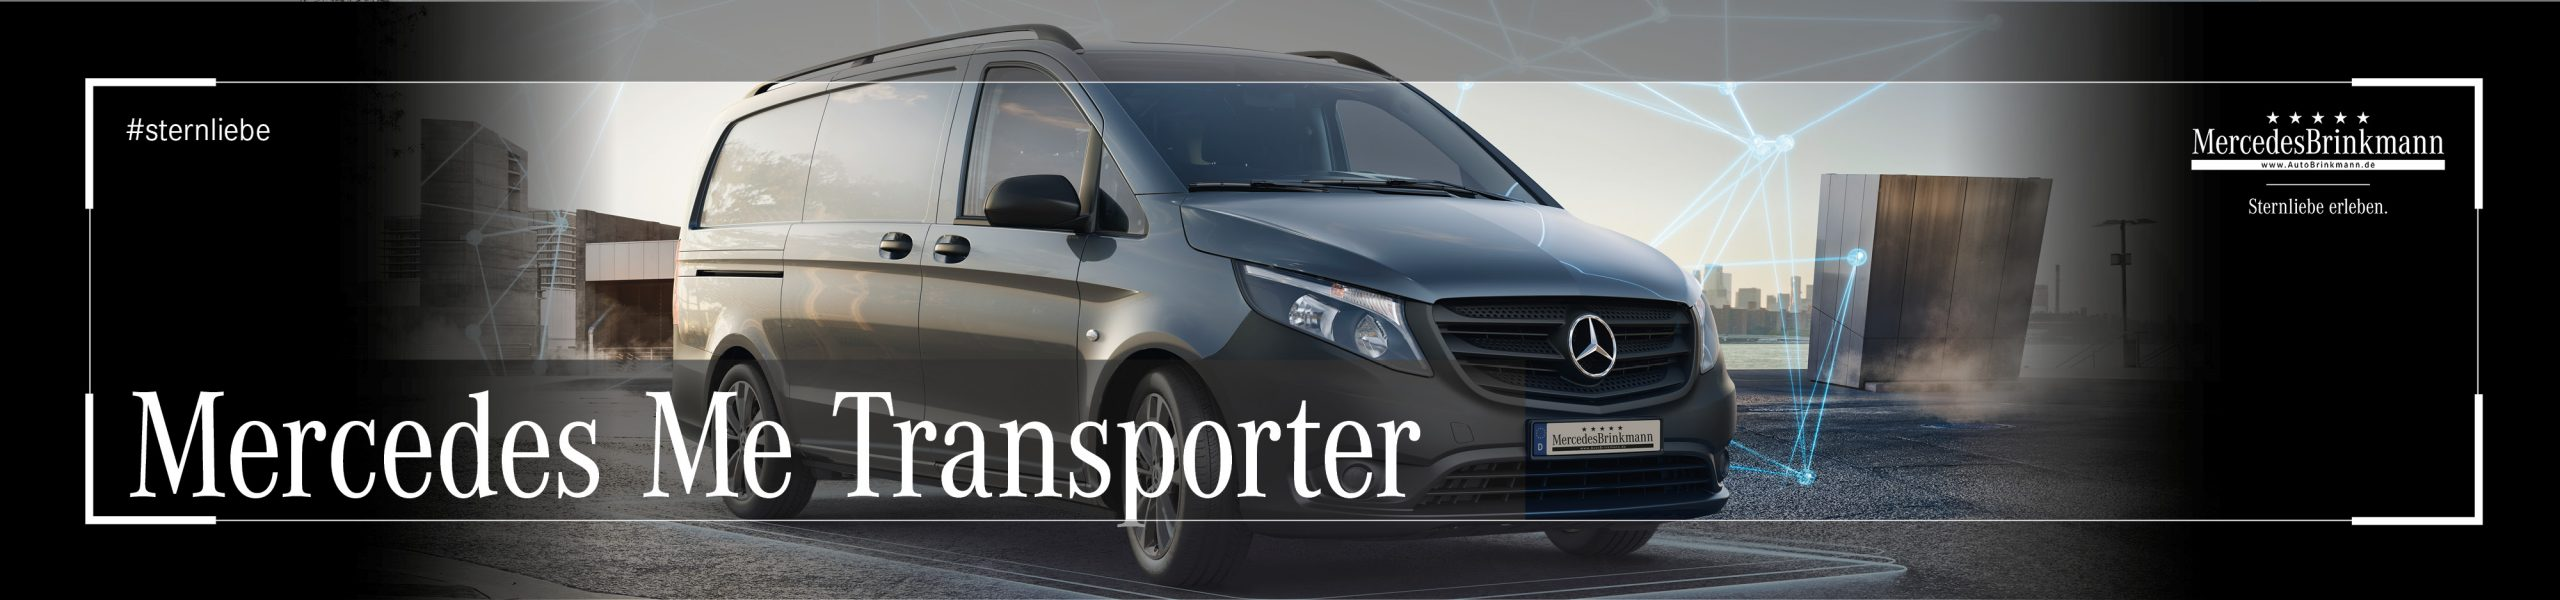 MercedesMe-Trapo mercedes benz brinkmann